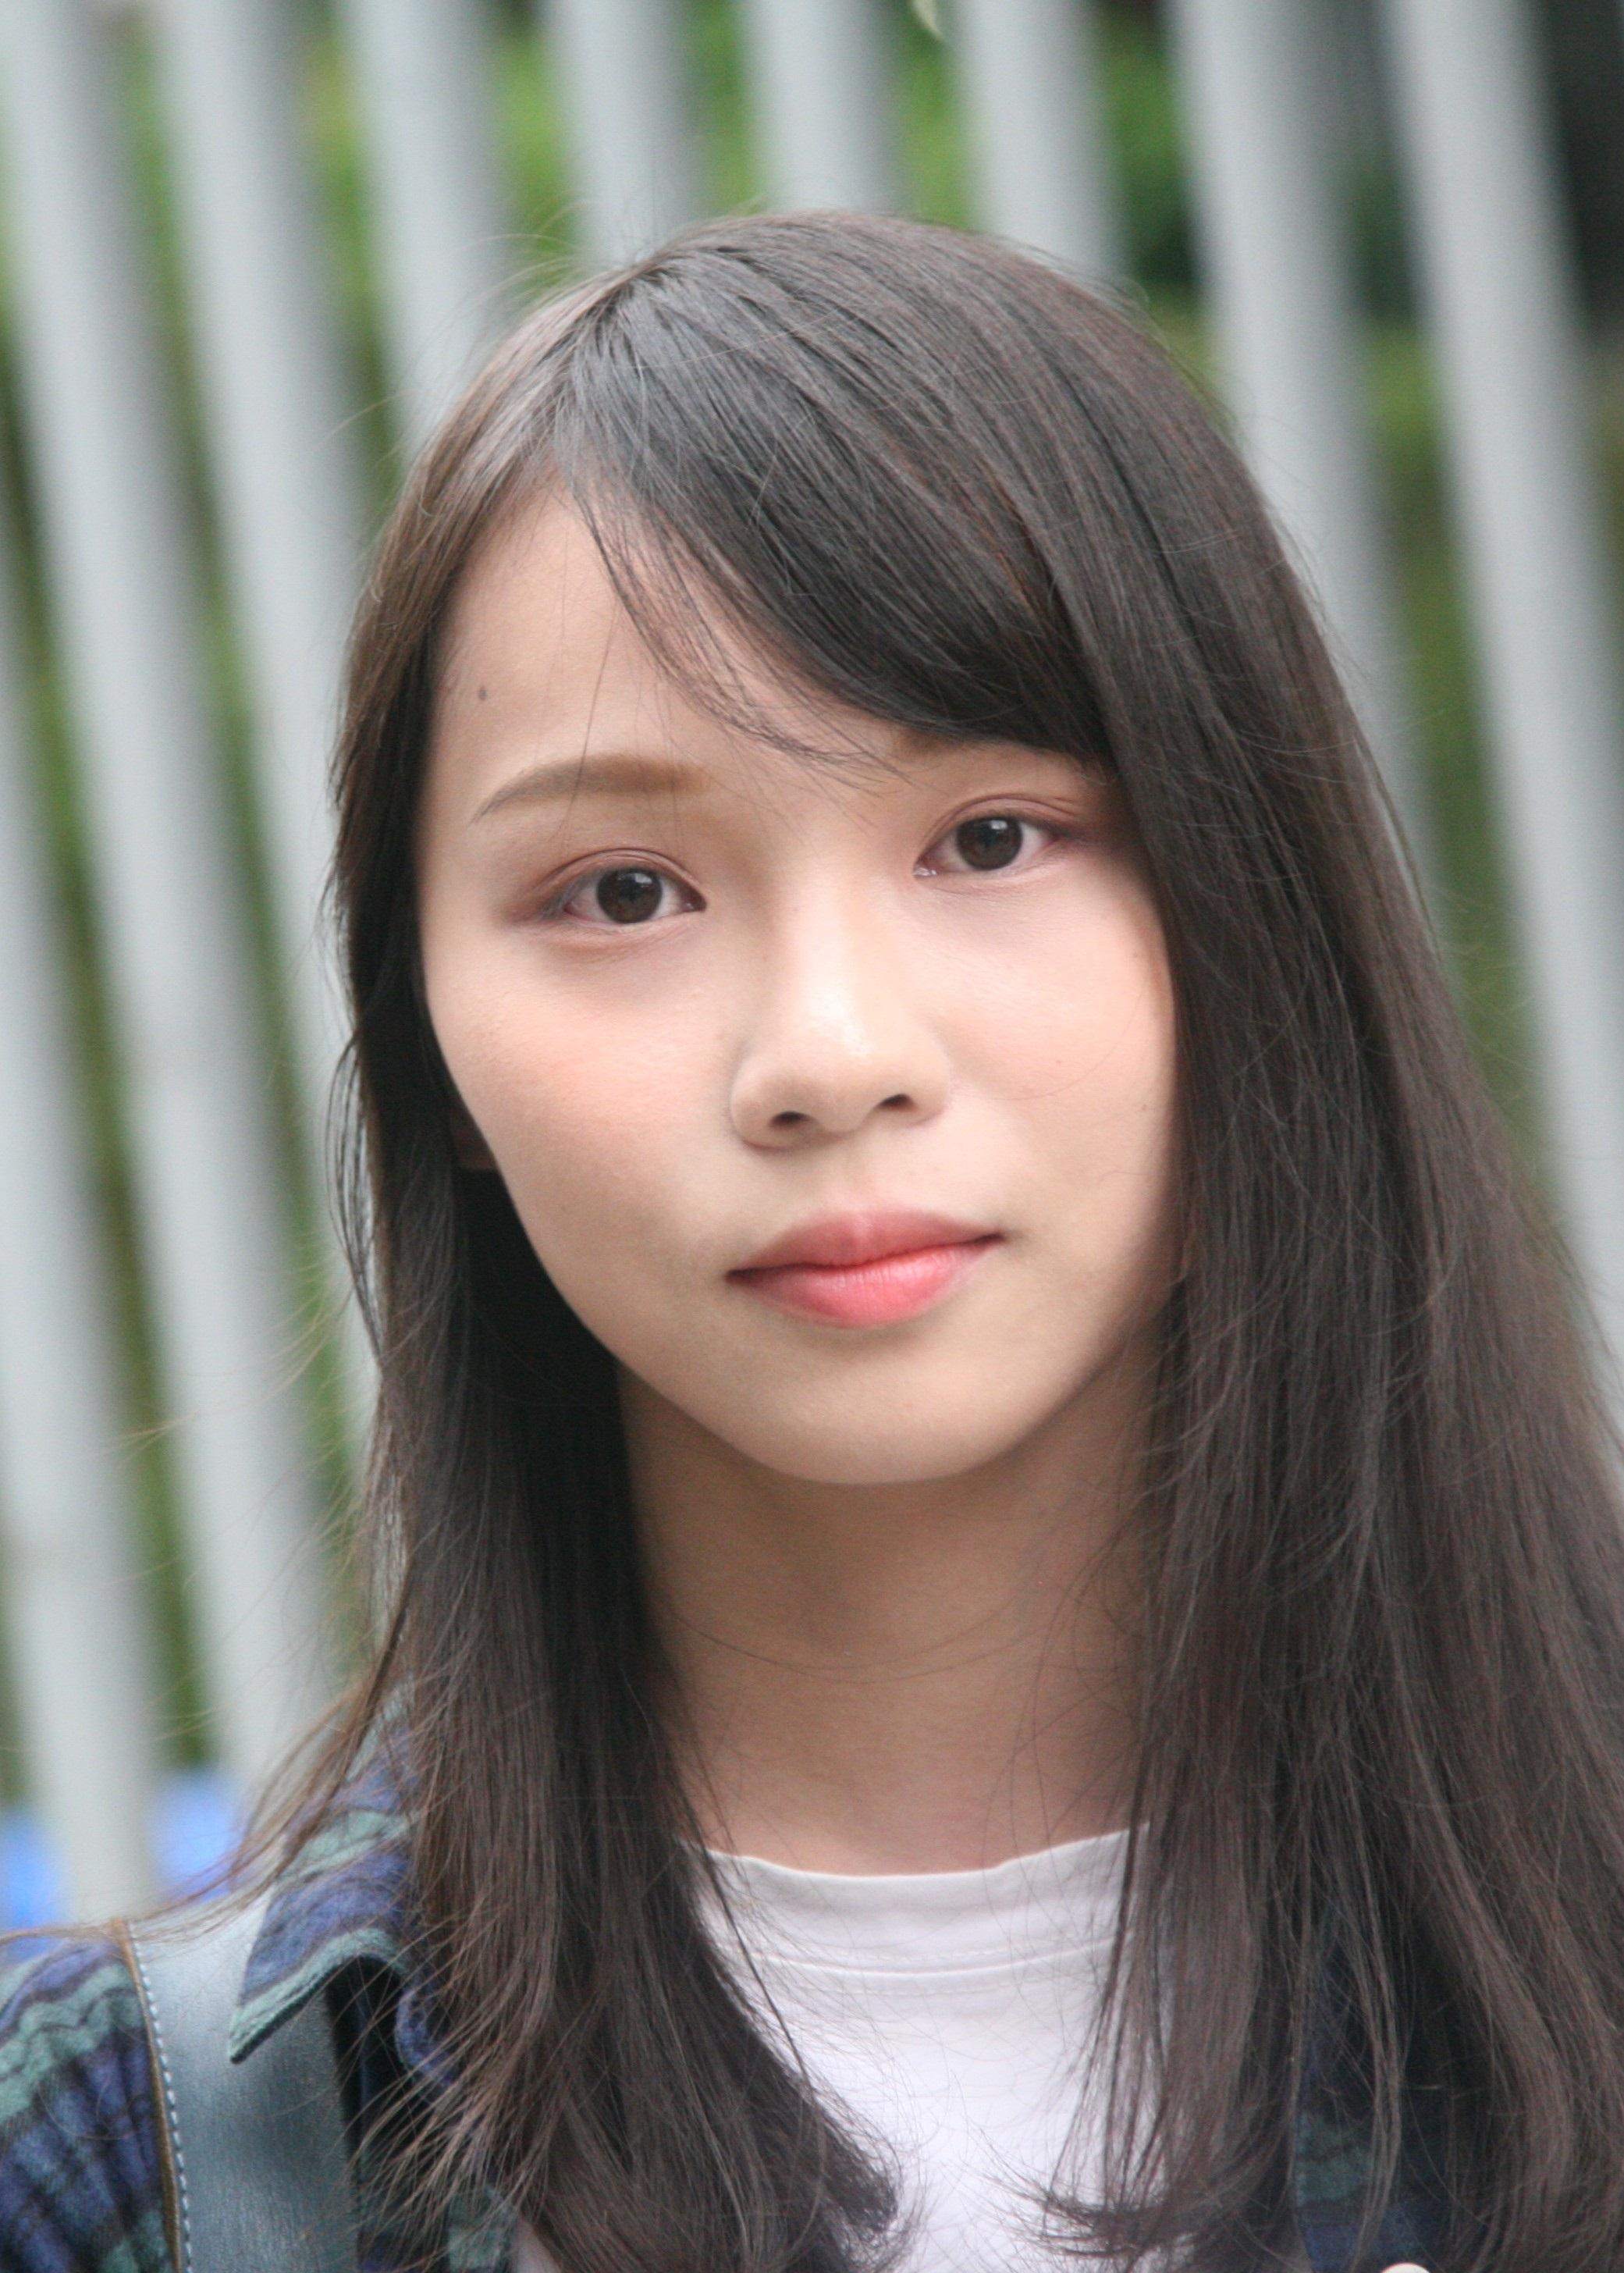 https://upload.wikimedia.org/wikipedia/commons/0/0b/Agnes_Chow_on_Tim_Mei_Avenue_%28cropped%29.jpg